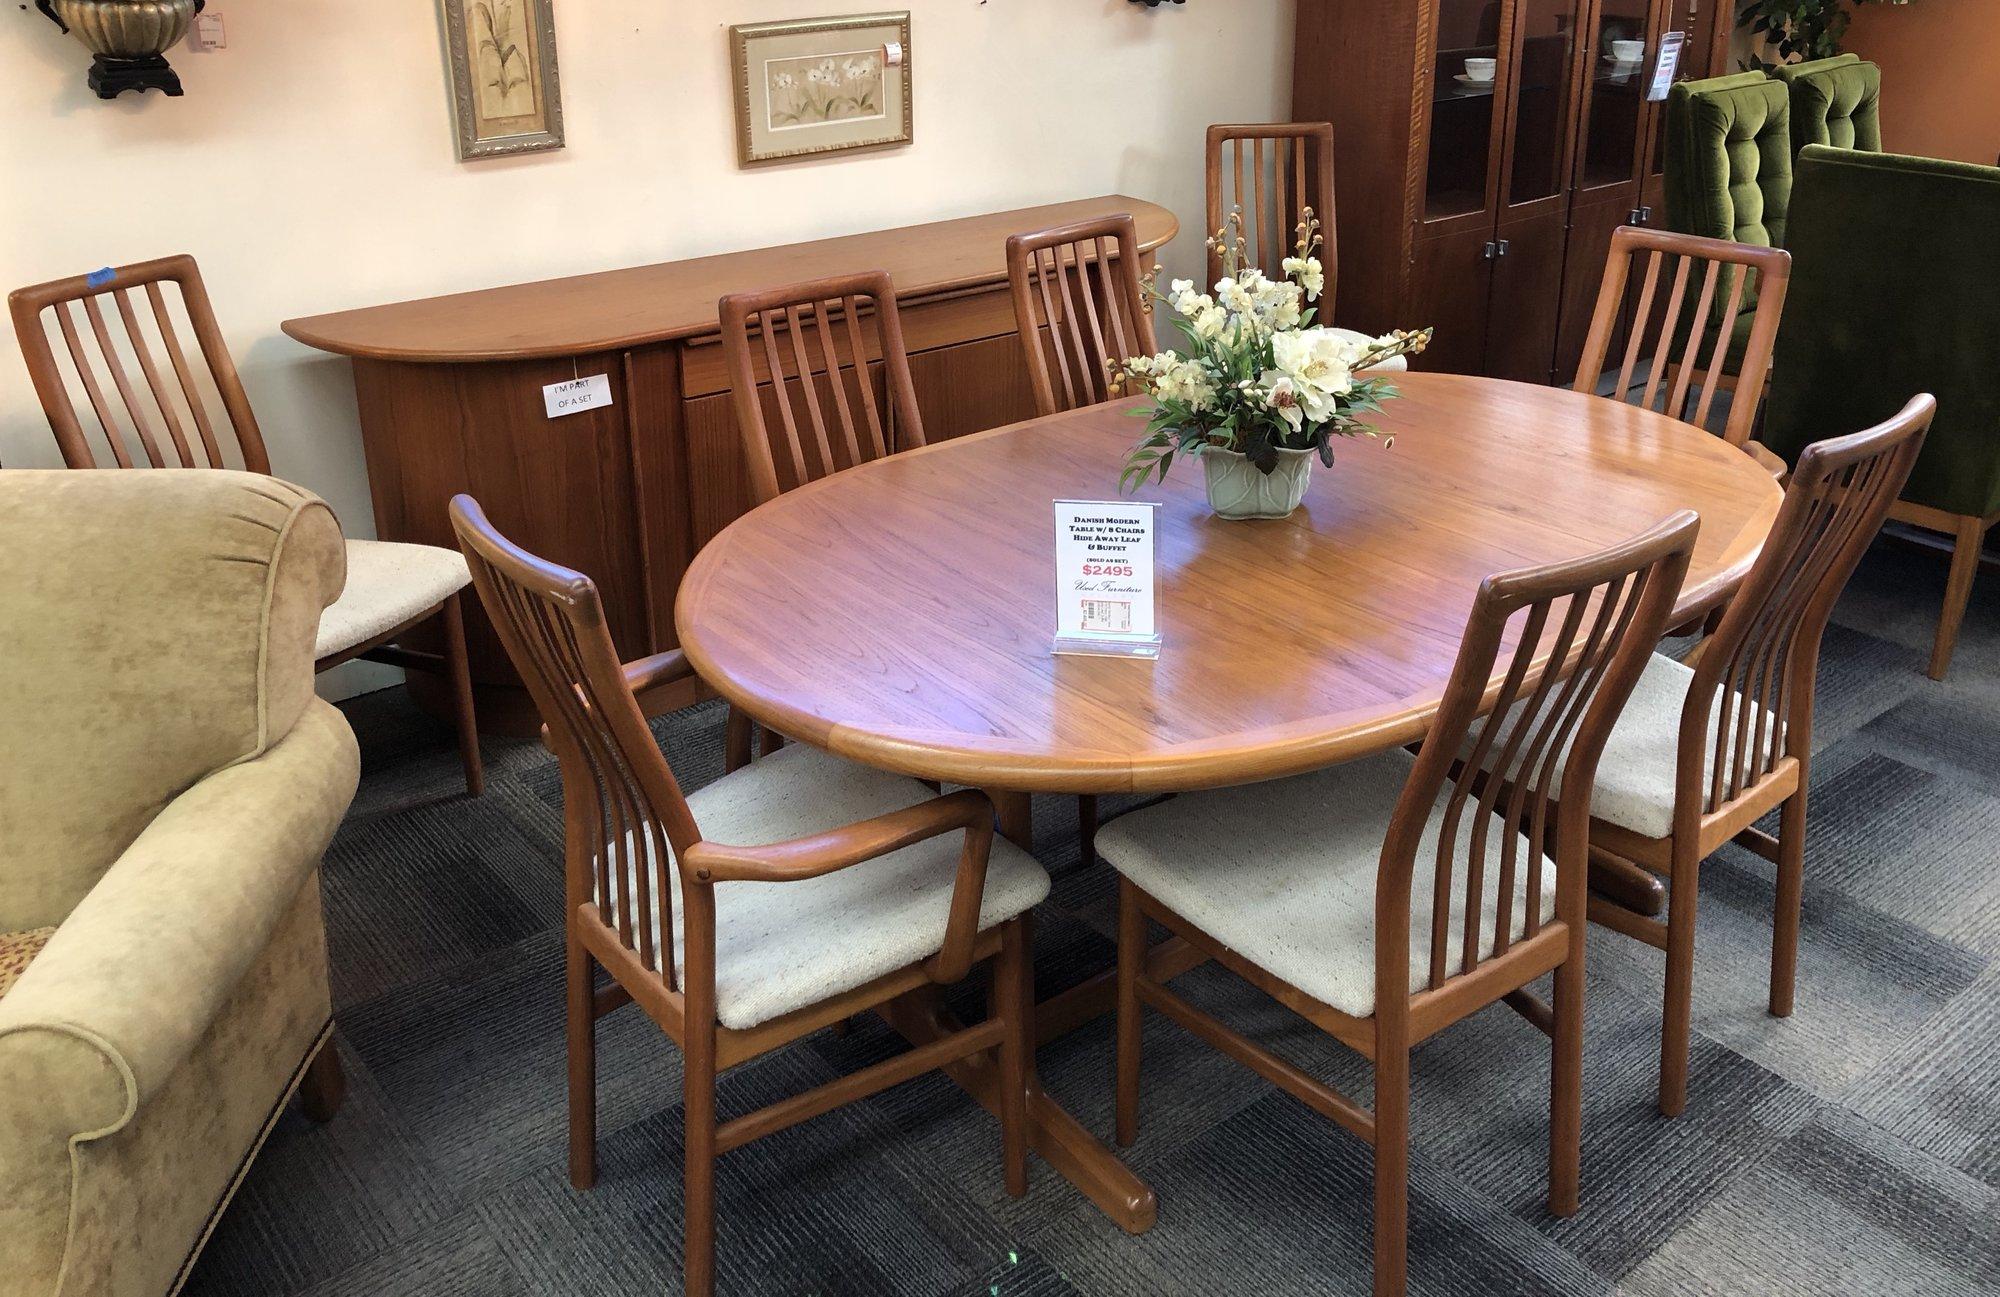 1 25788 Danish Modern Table W/ 8 Chairs, Hide Away Leaf, Buffet 1 25788  Danish Modern Table W/ 8 Chairs, Hide Away Leaf, Buffet